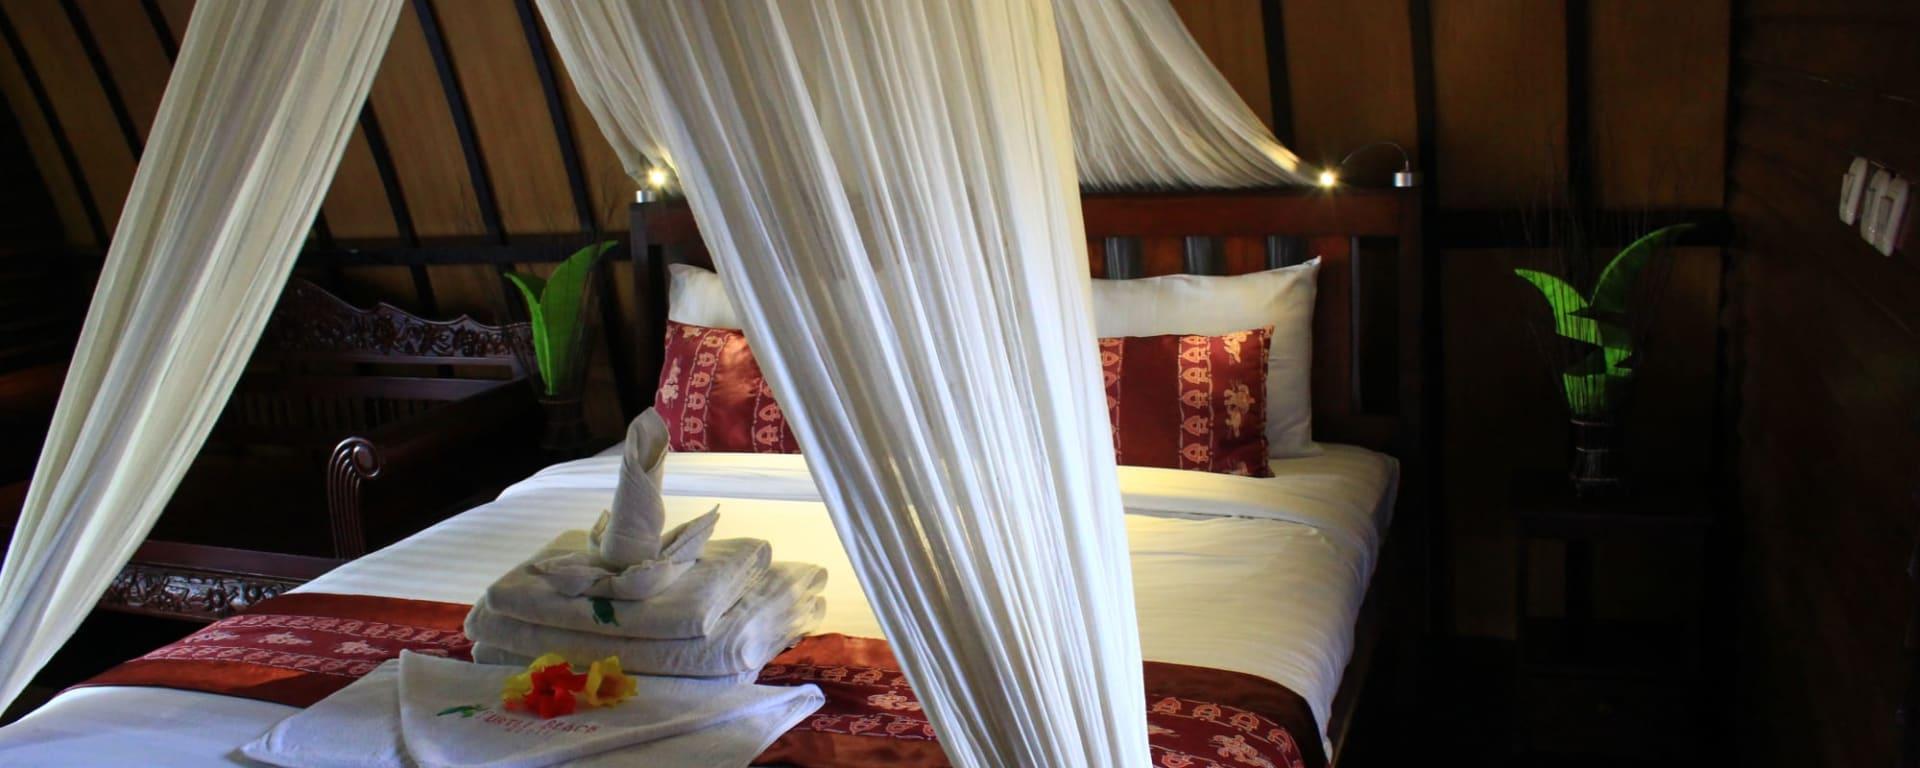 Turtle Beach Hotel in Gili: Gili Air Turtle Beach Beach Zimmer